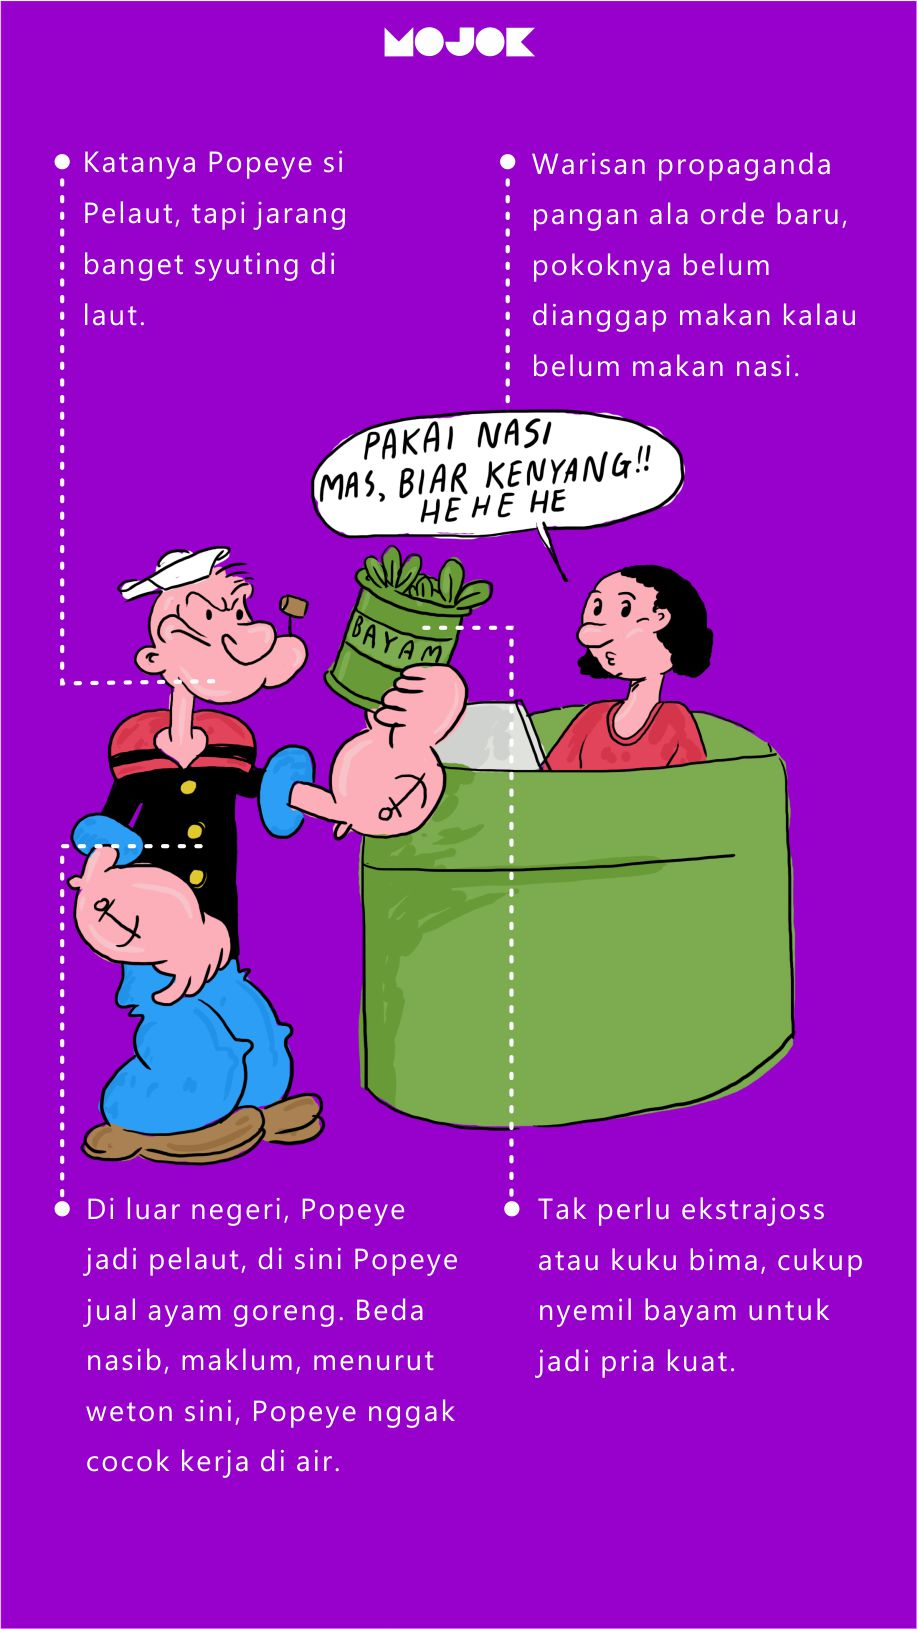 Popeye bayam